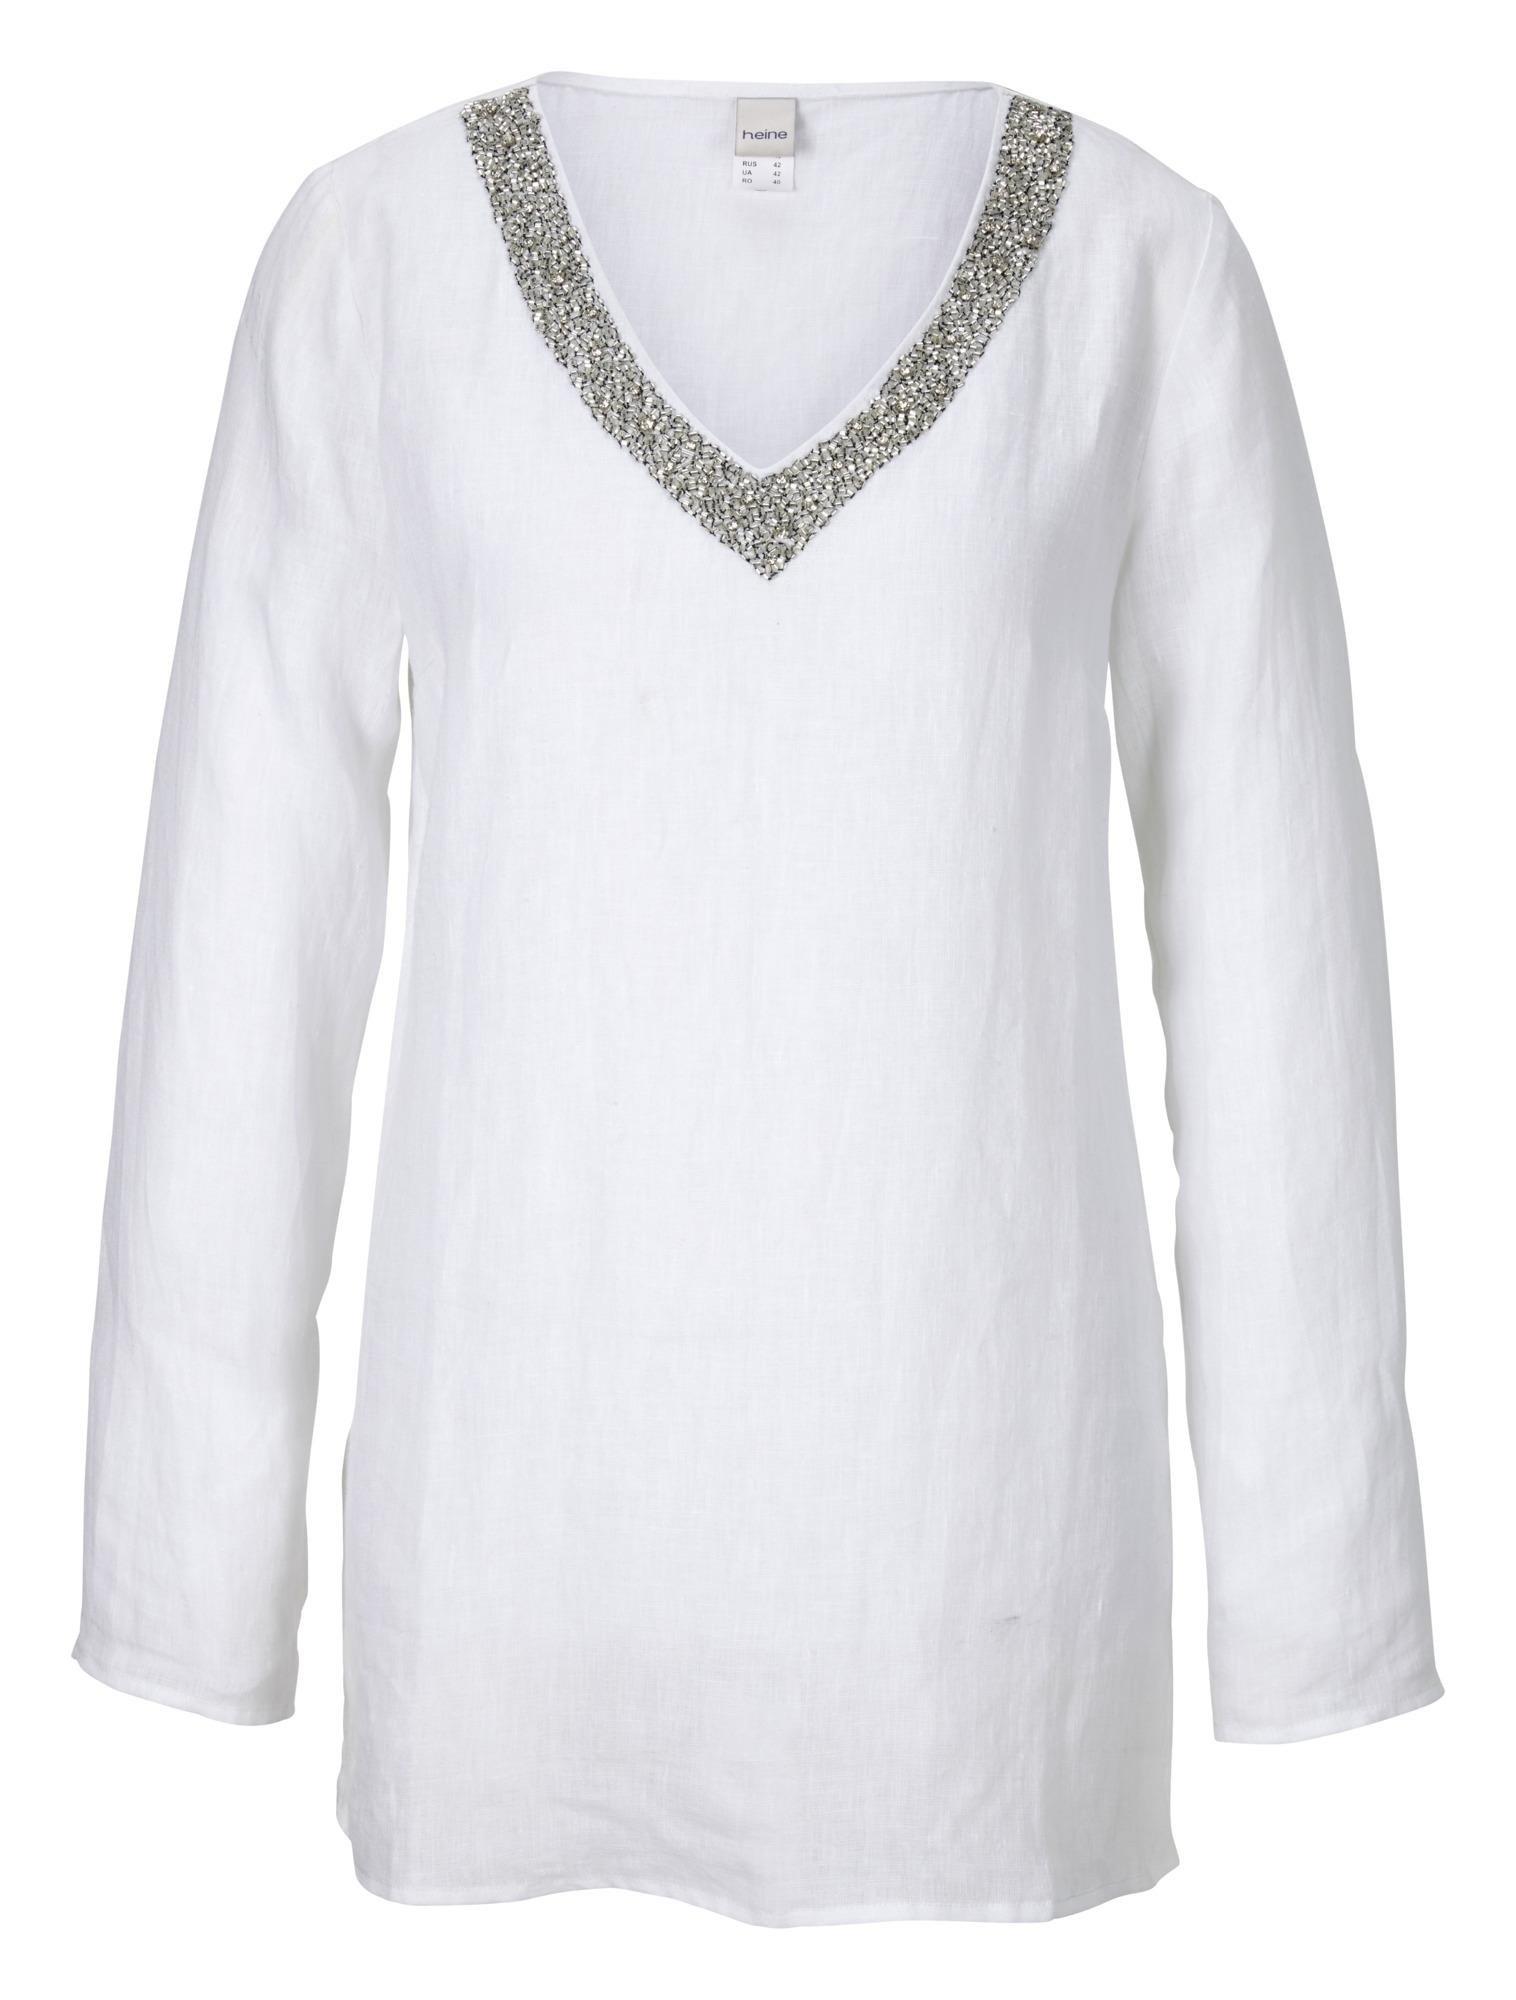 RICK CARDONA by Heine Linnen blouse bij OTTO online kopen